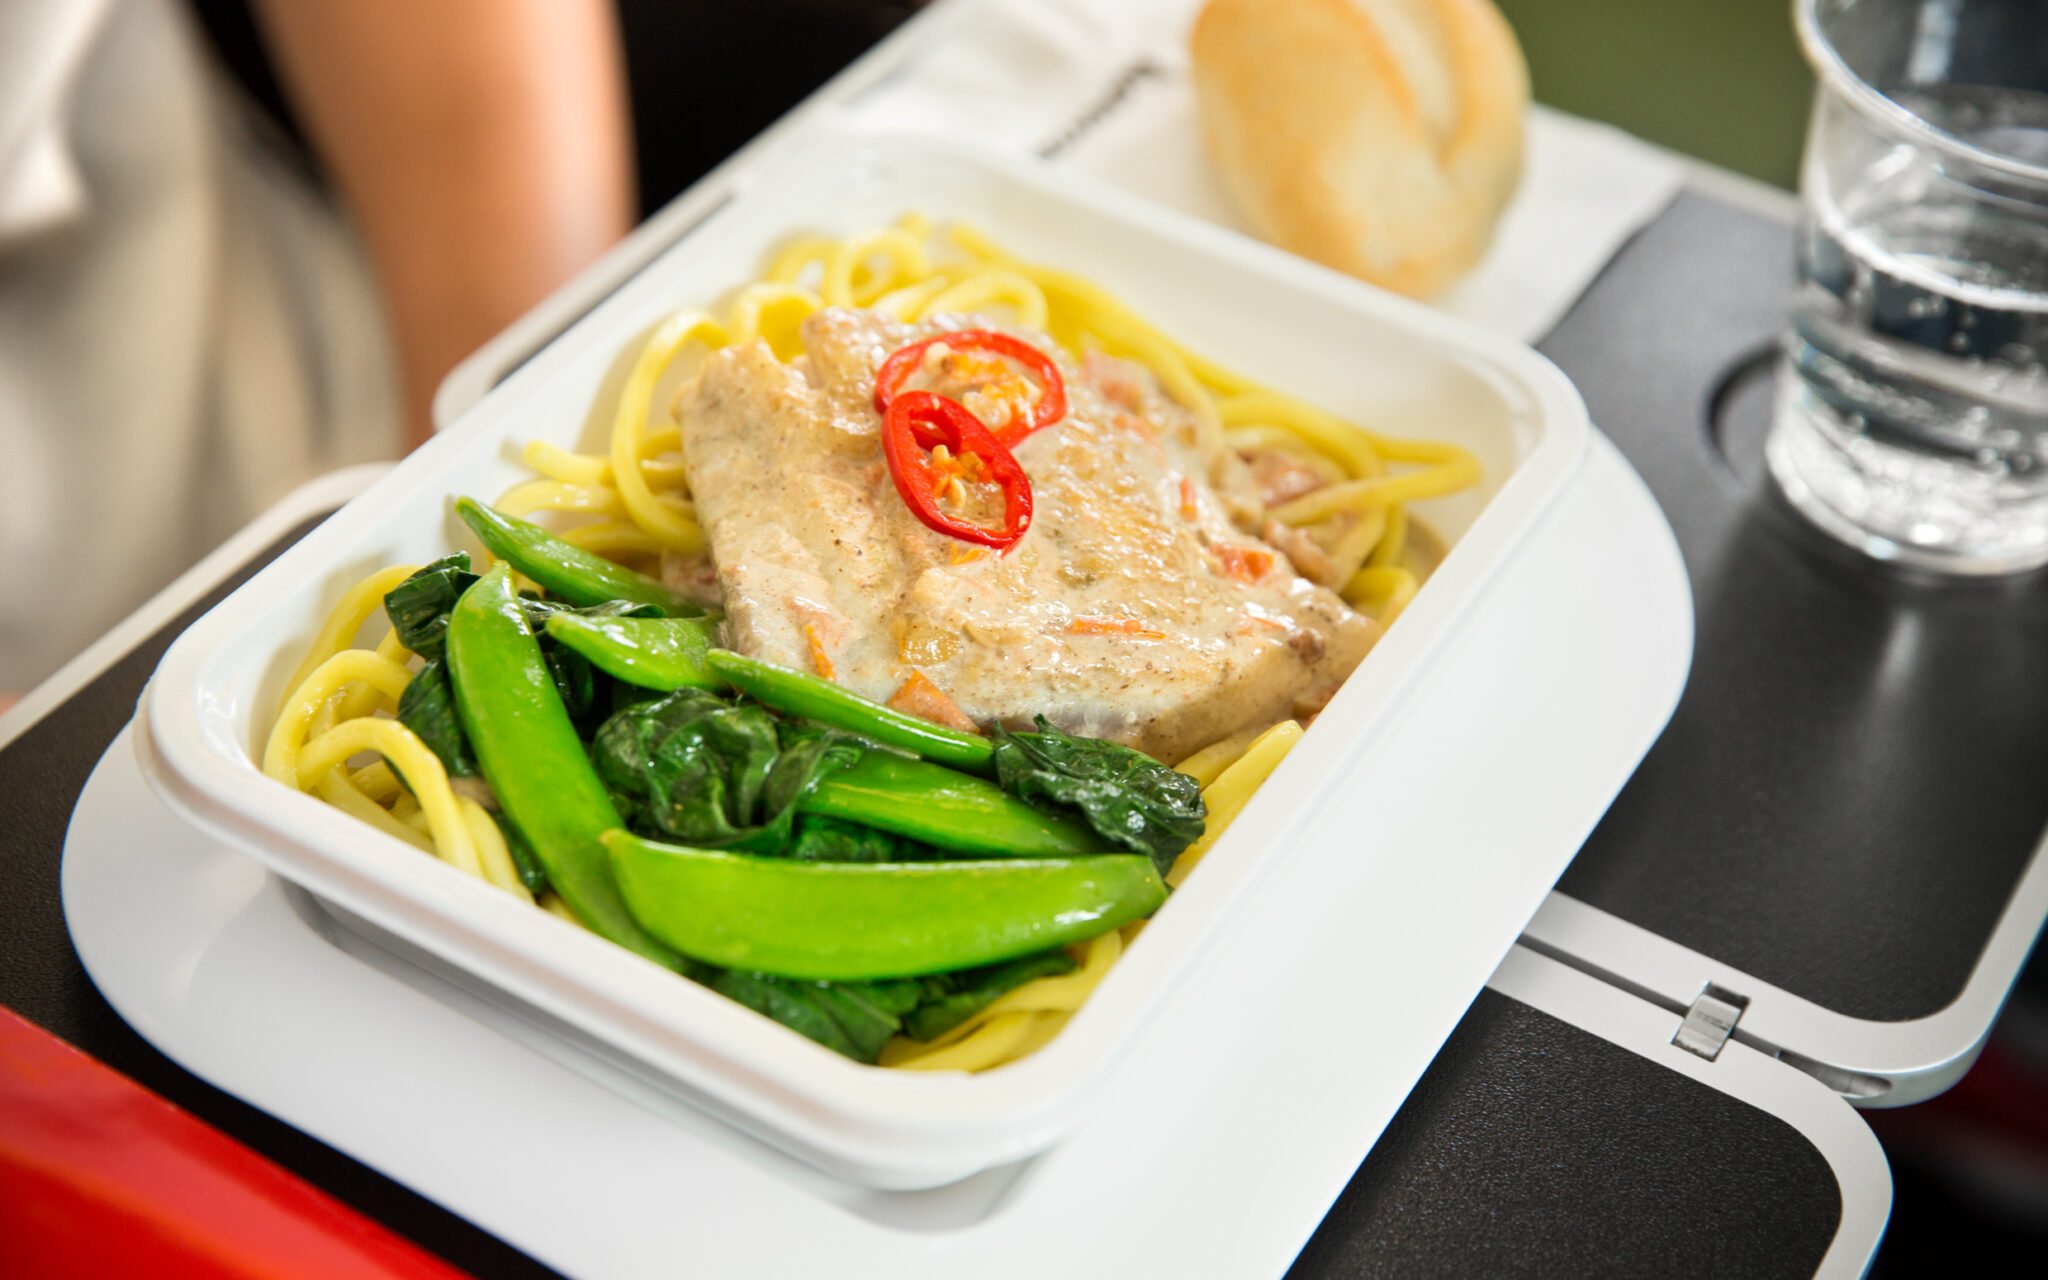 Qantas meal being served in flight.